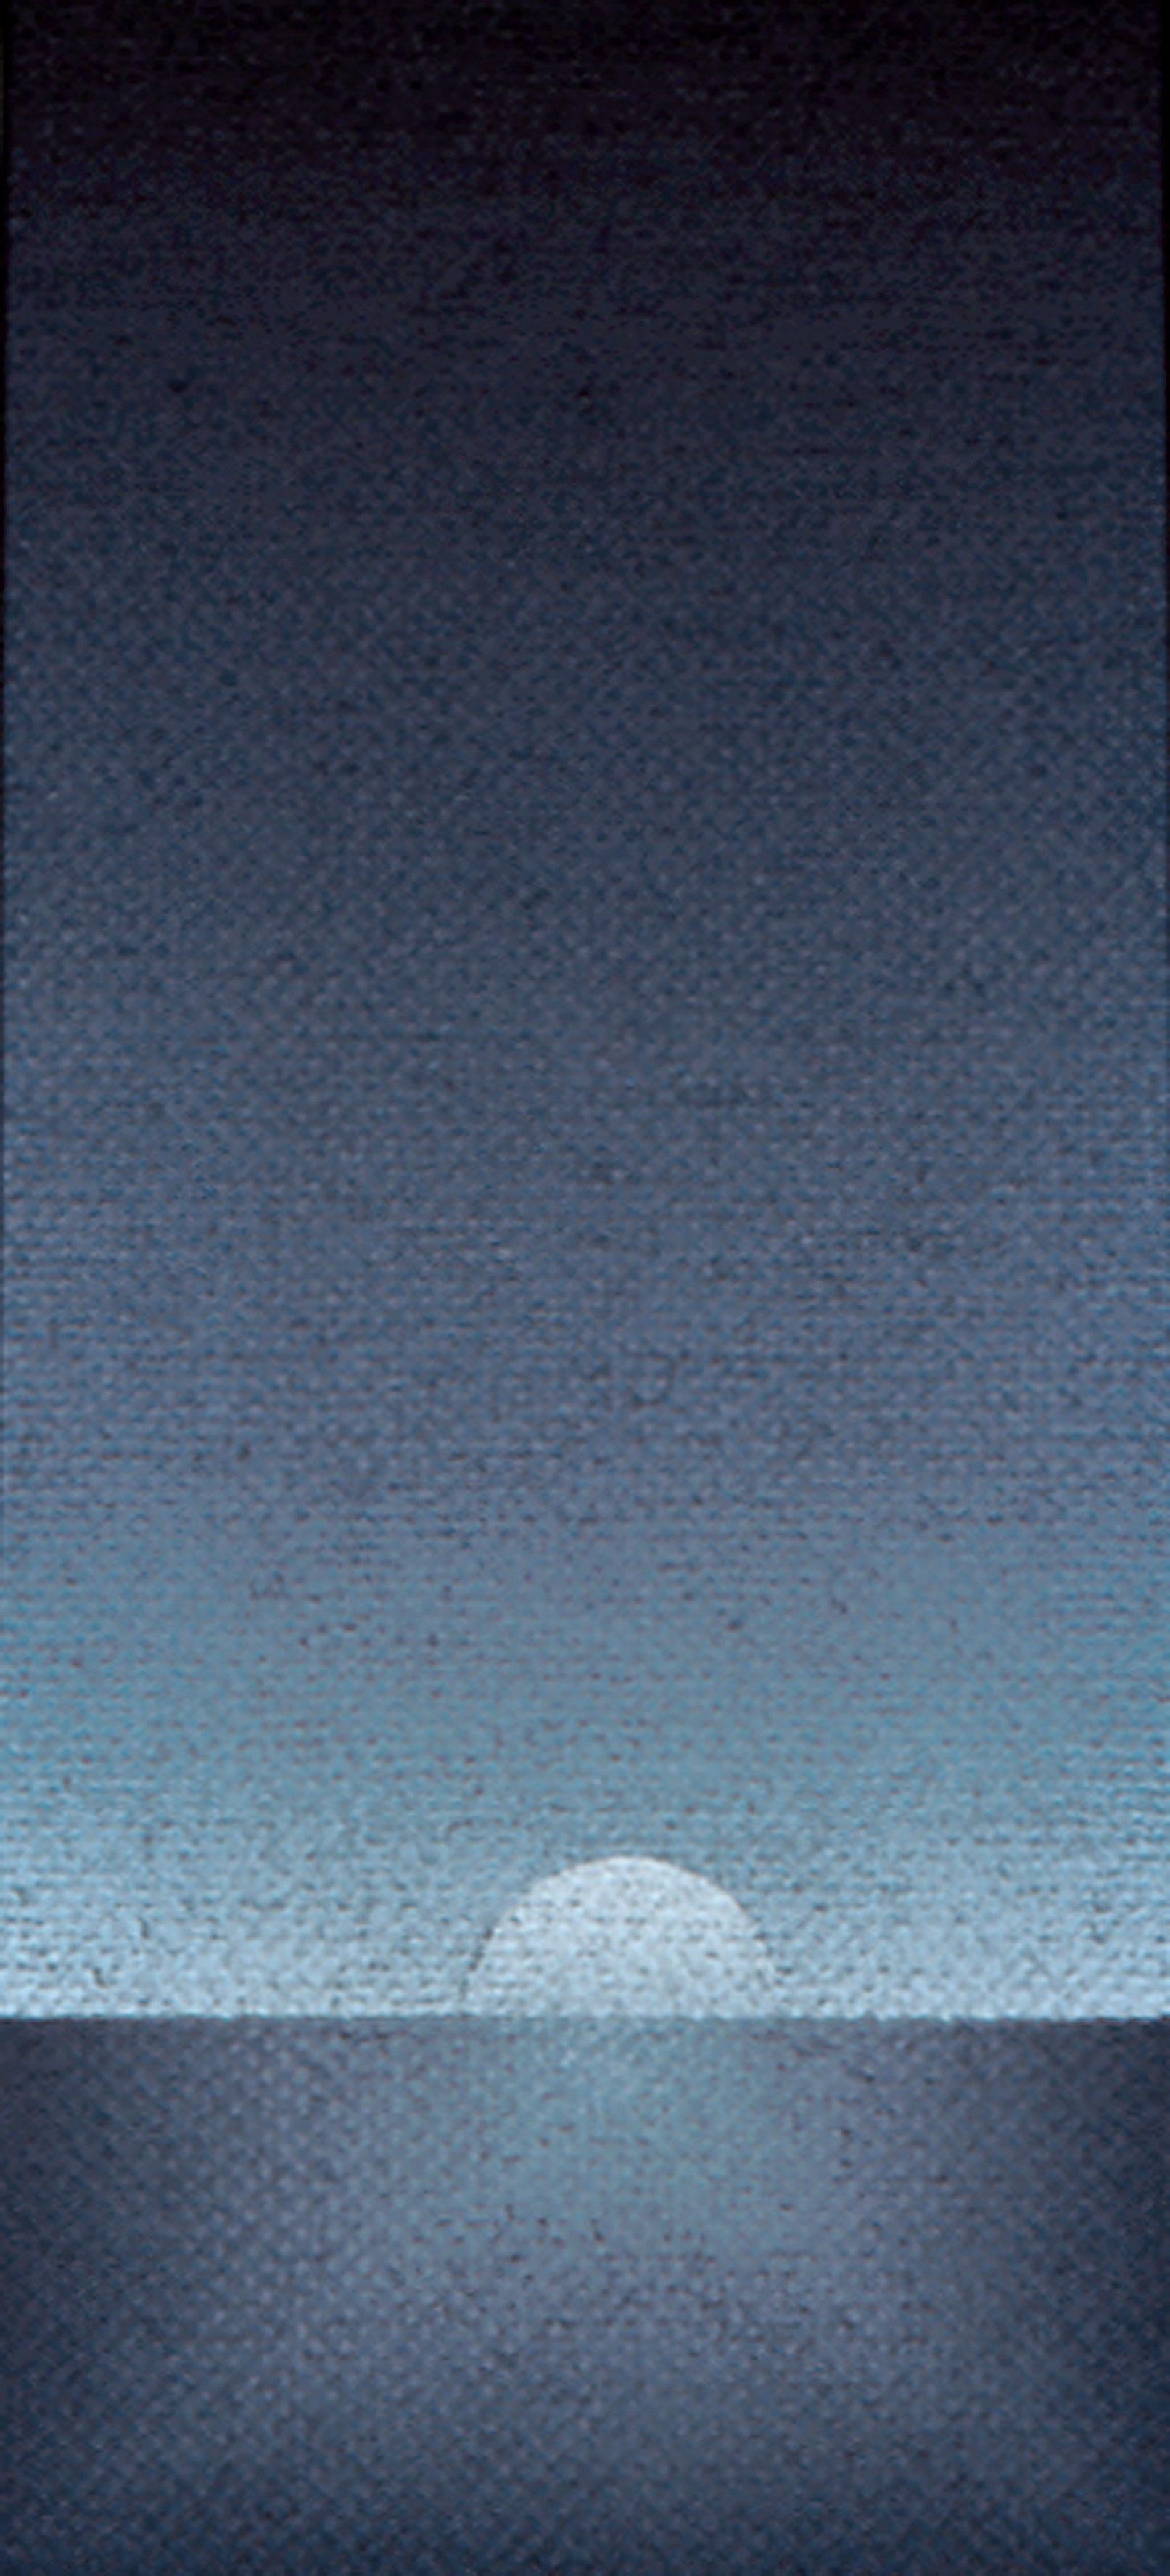 52701-A